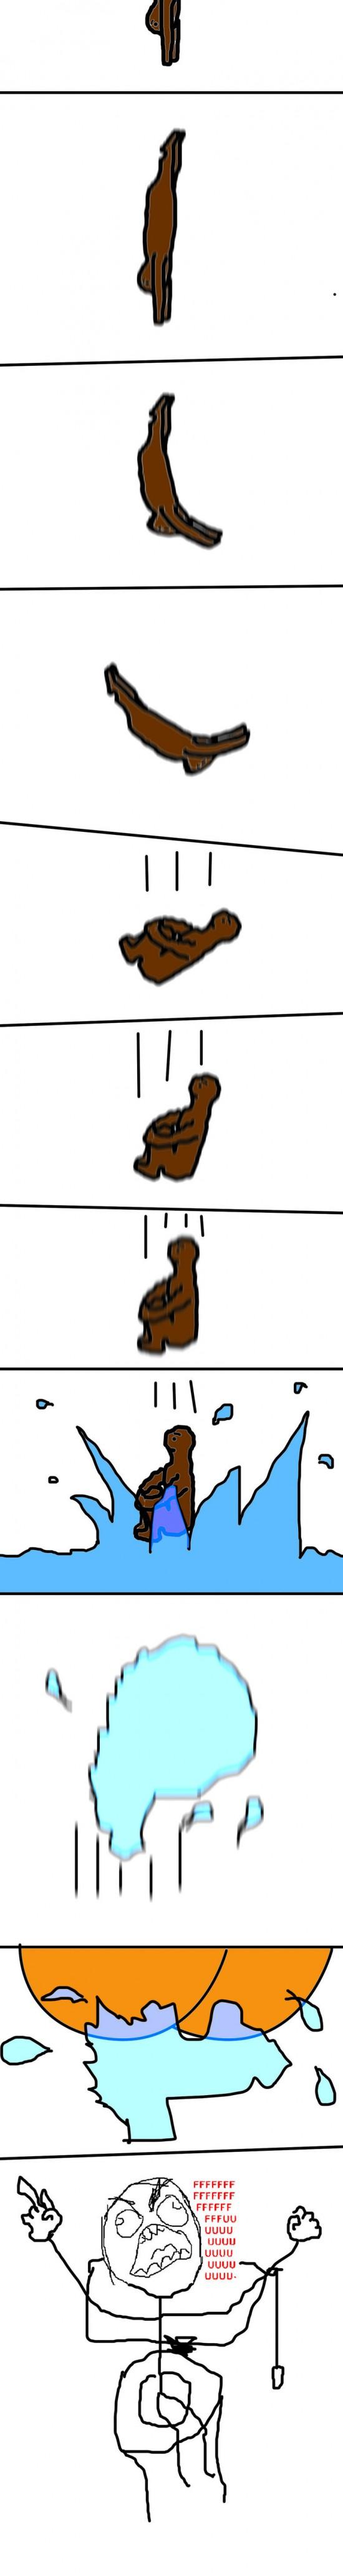 baño,cagar,mojar,salto